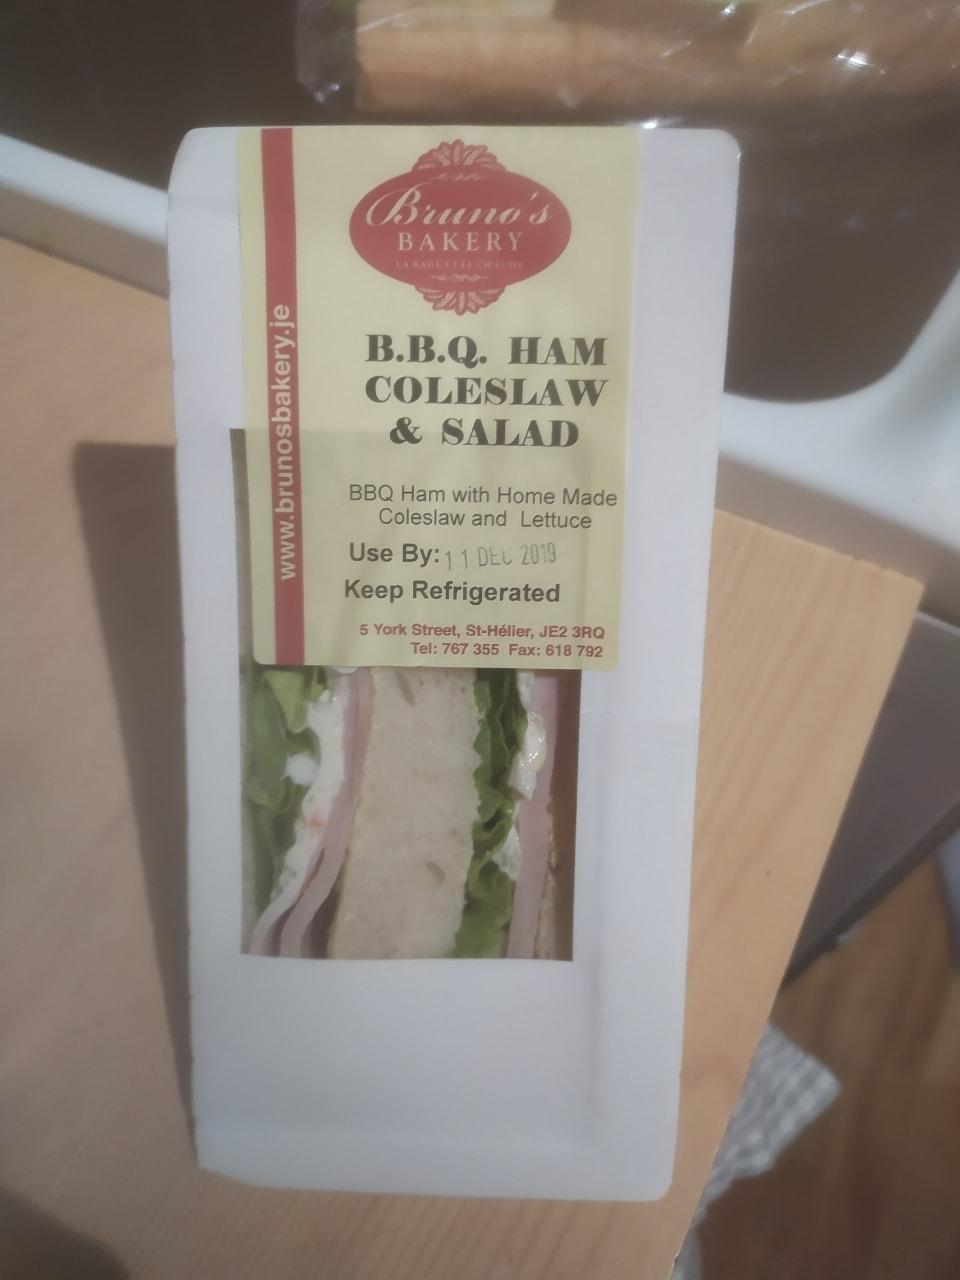 BBQ ham, coleslaw and salad sandwich